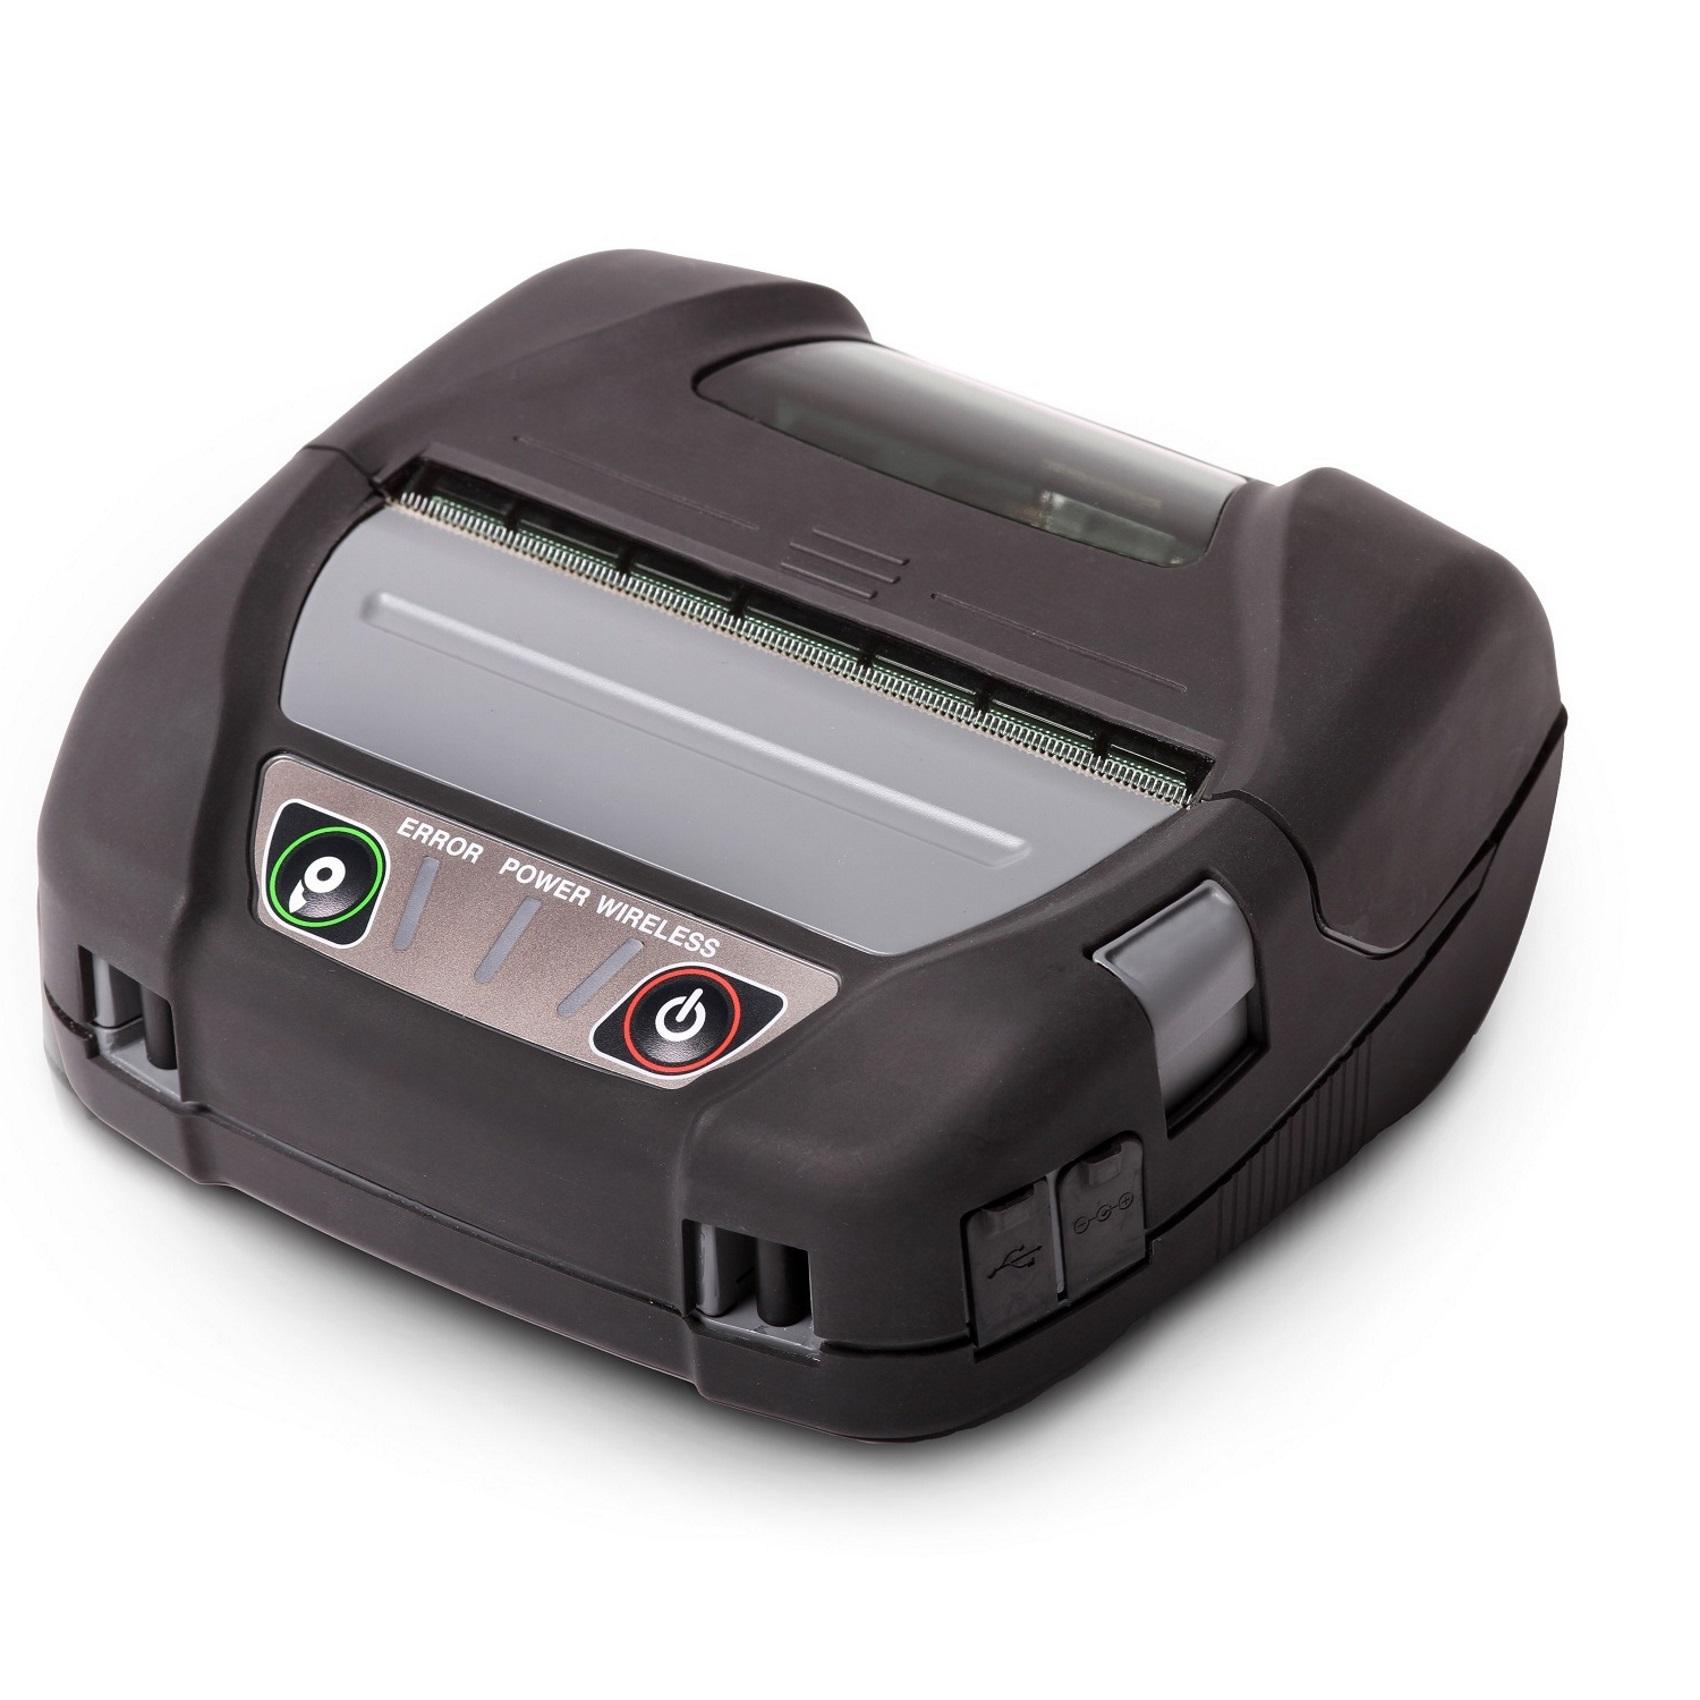 Mobilna-drukarka-termiczna-Seiko-Instruments-MP-A40